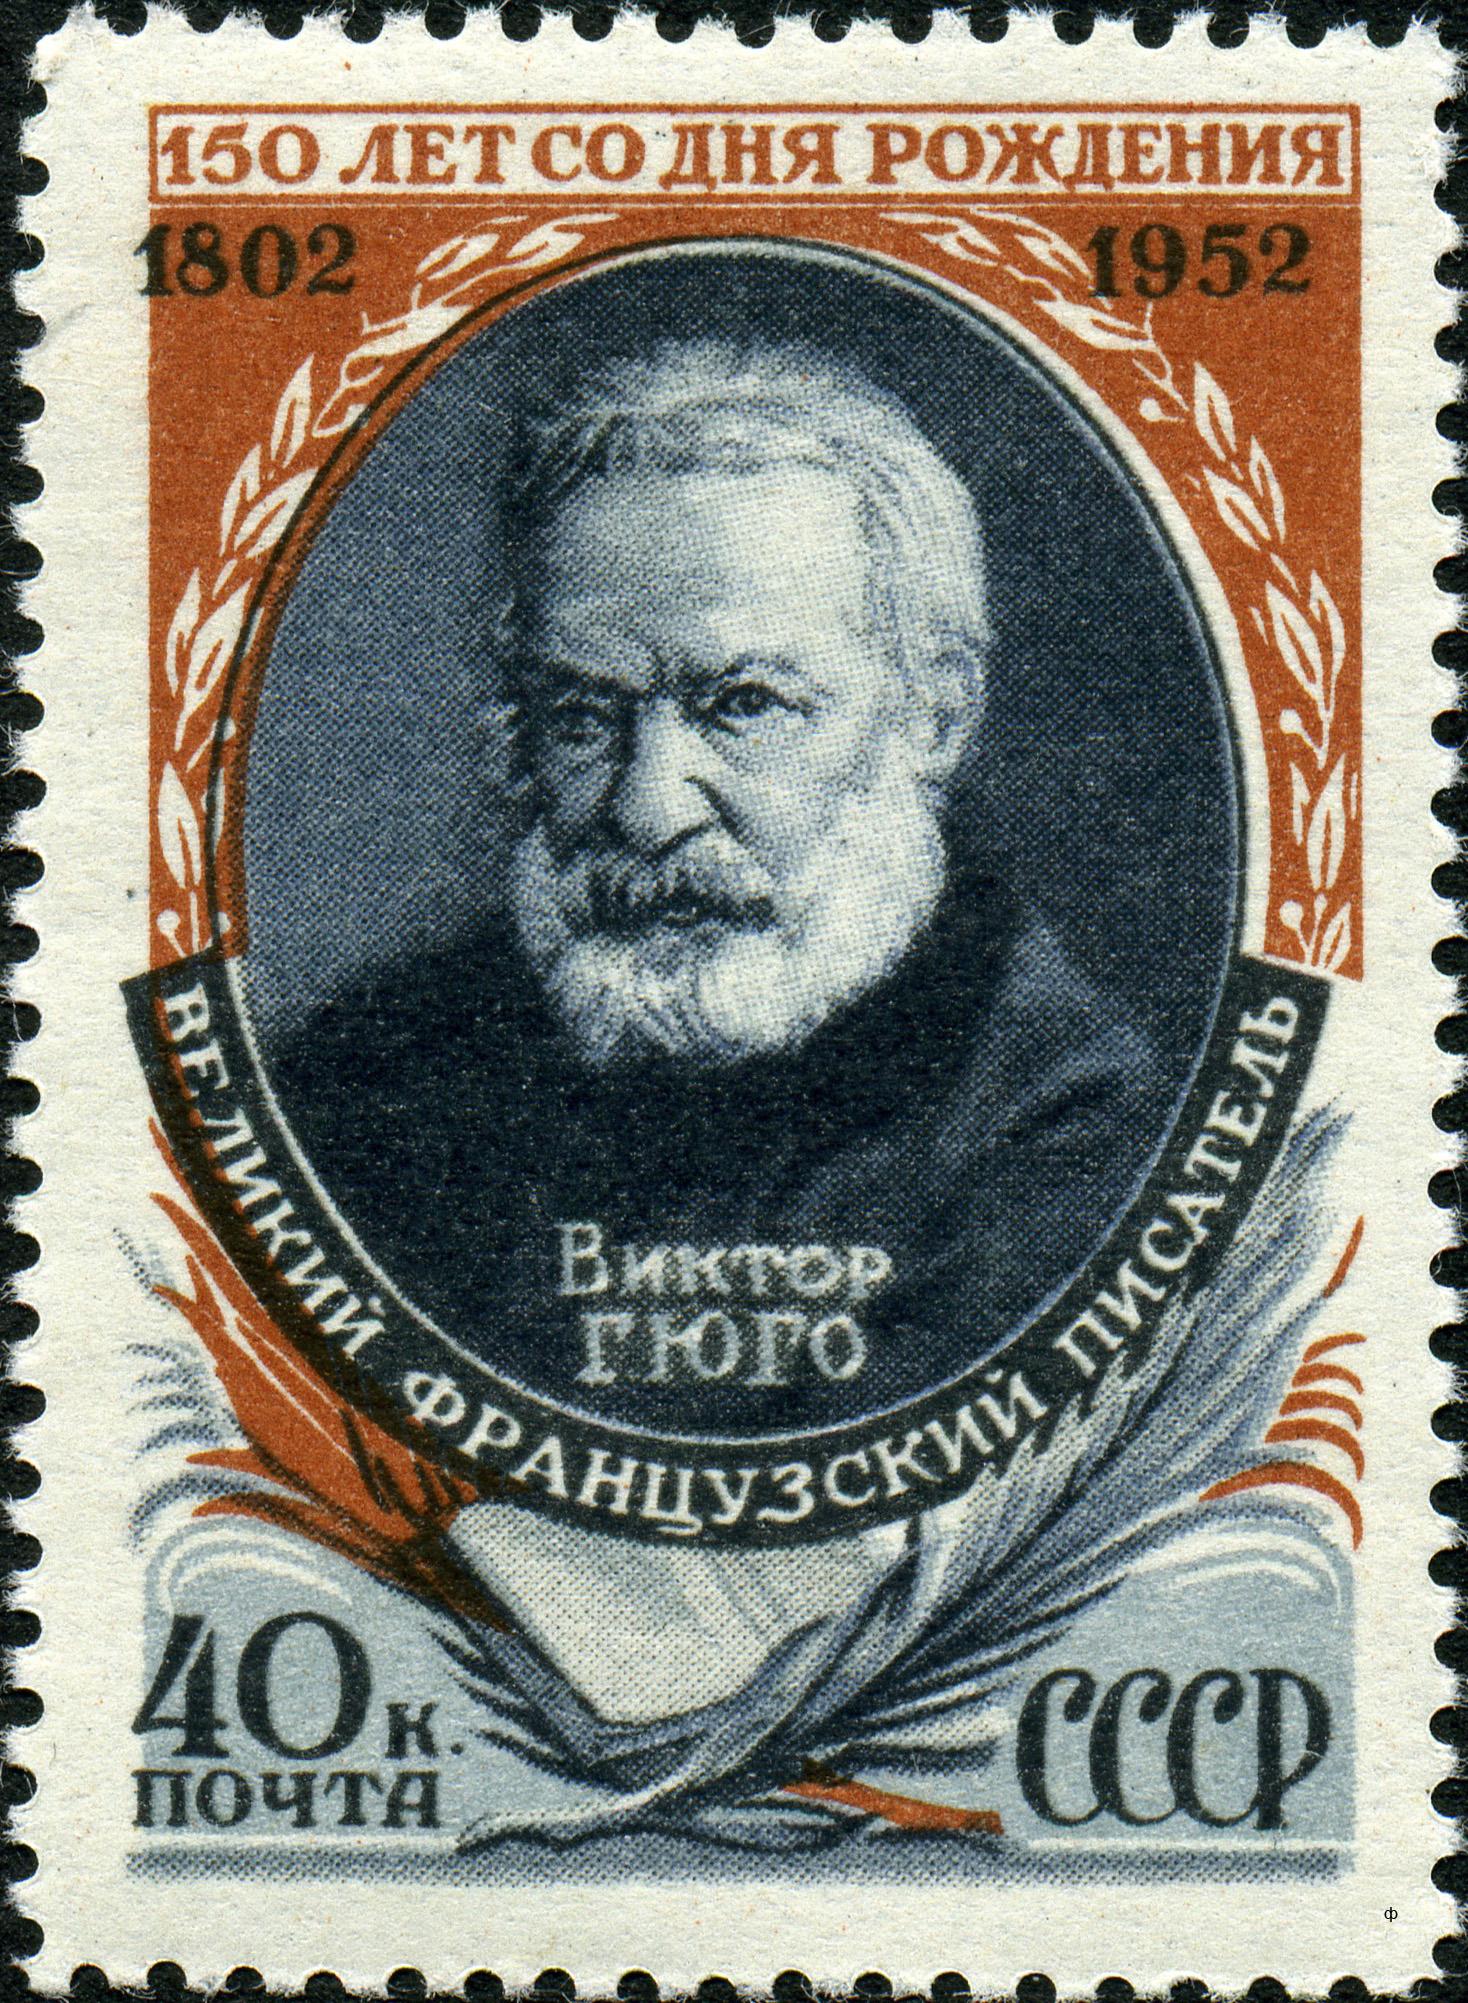 1952 Soviet Union postage stamp.